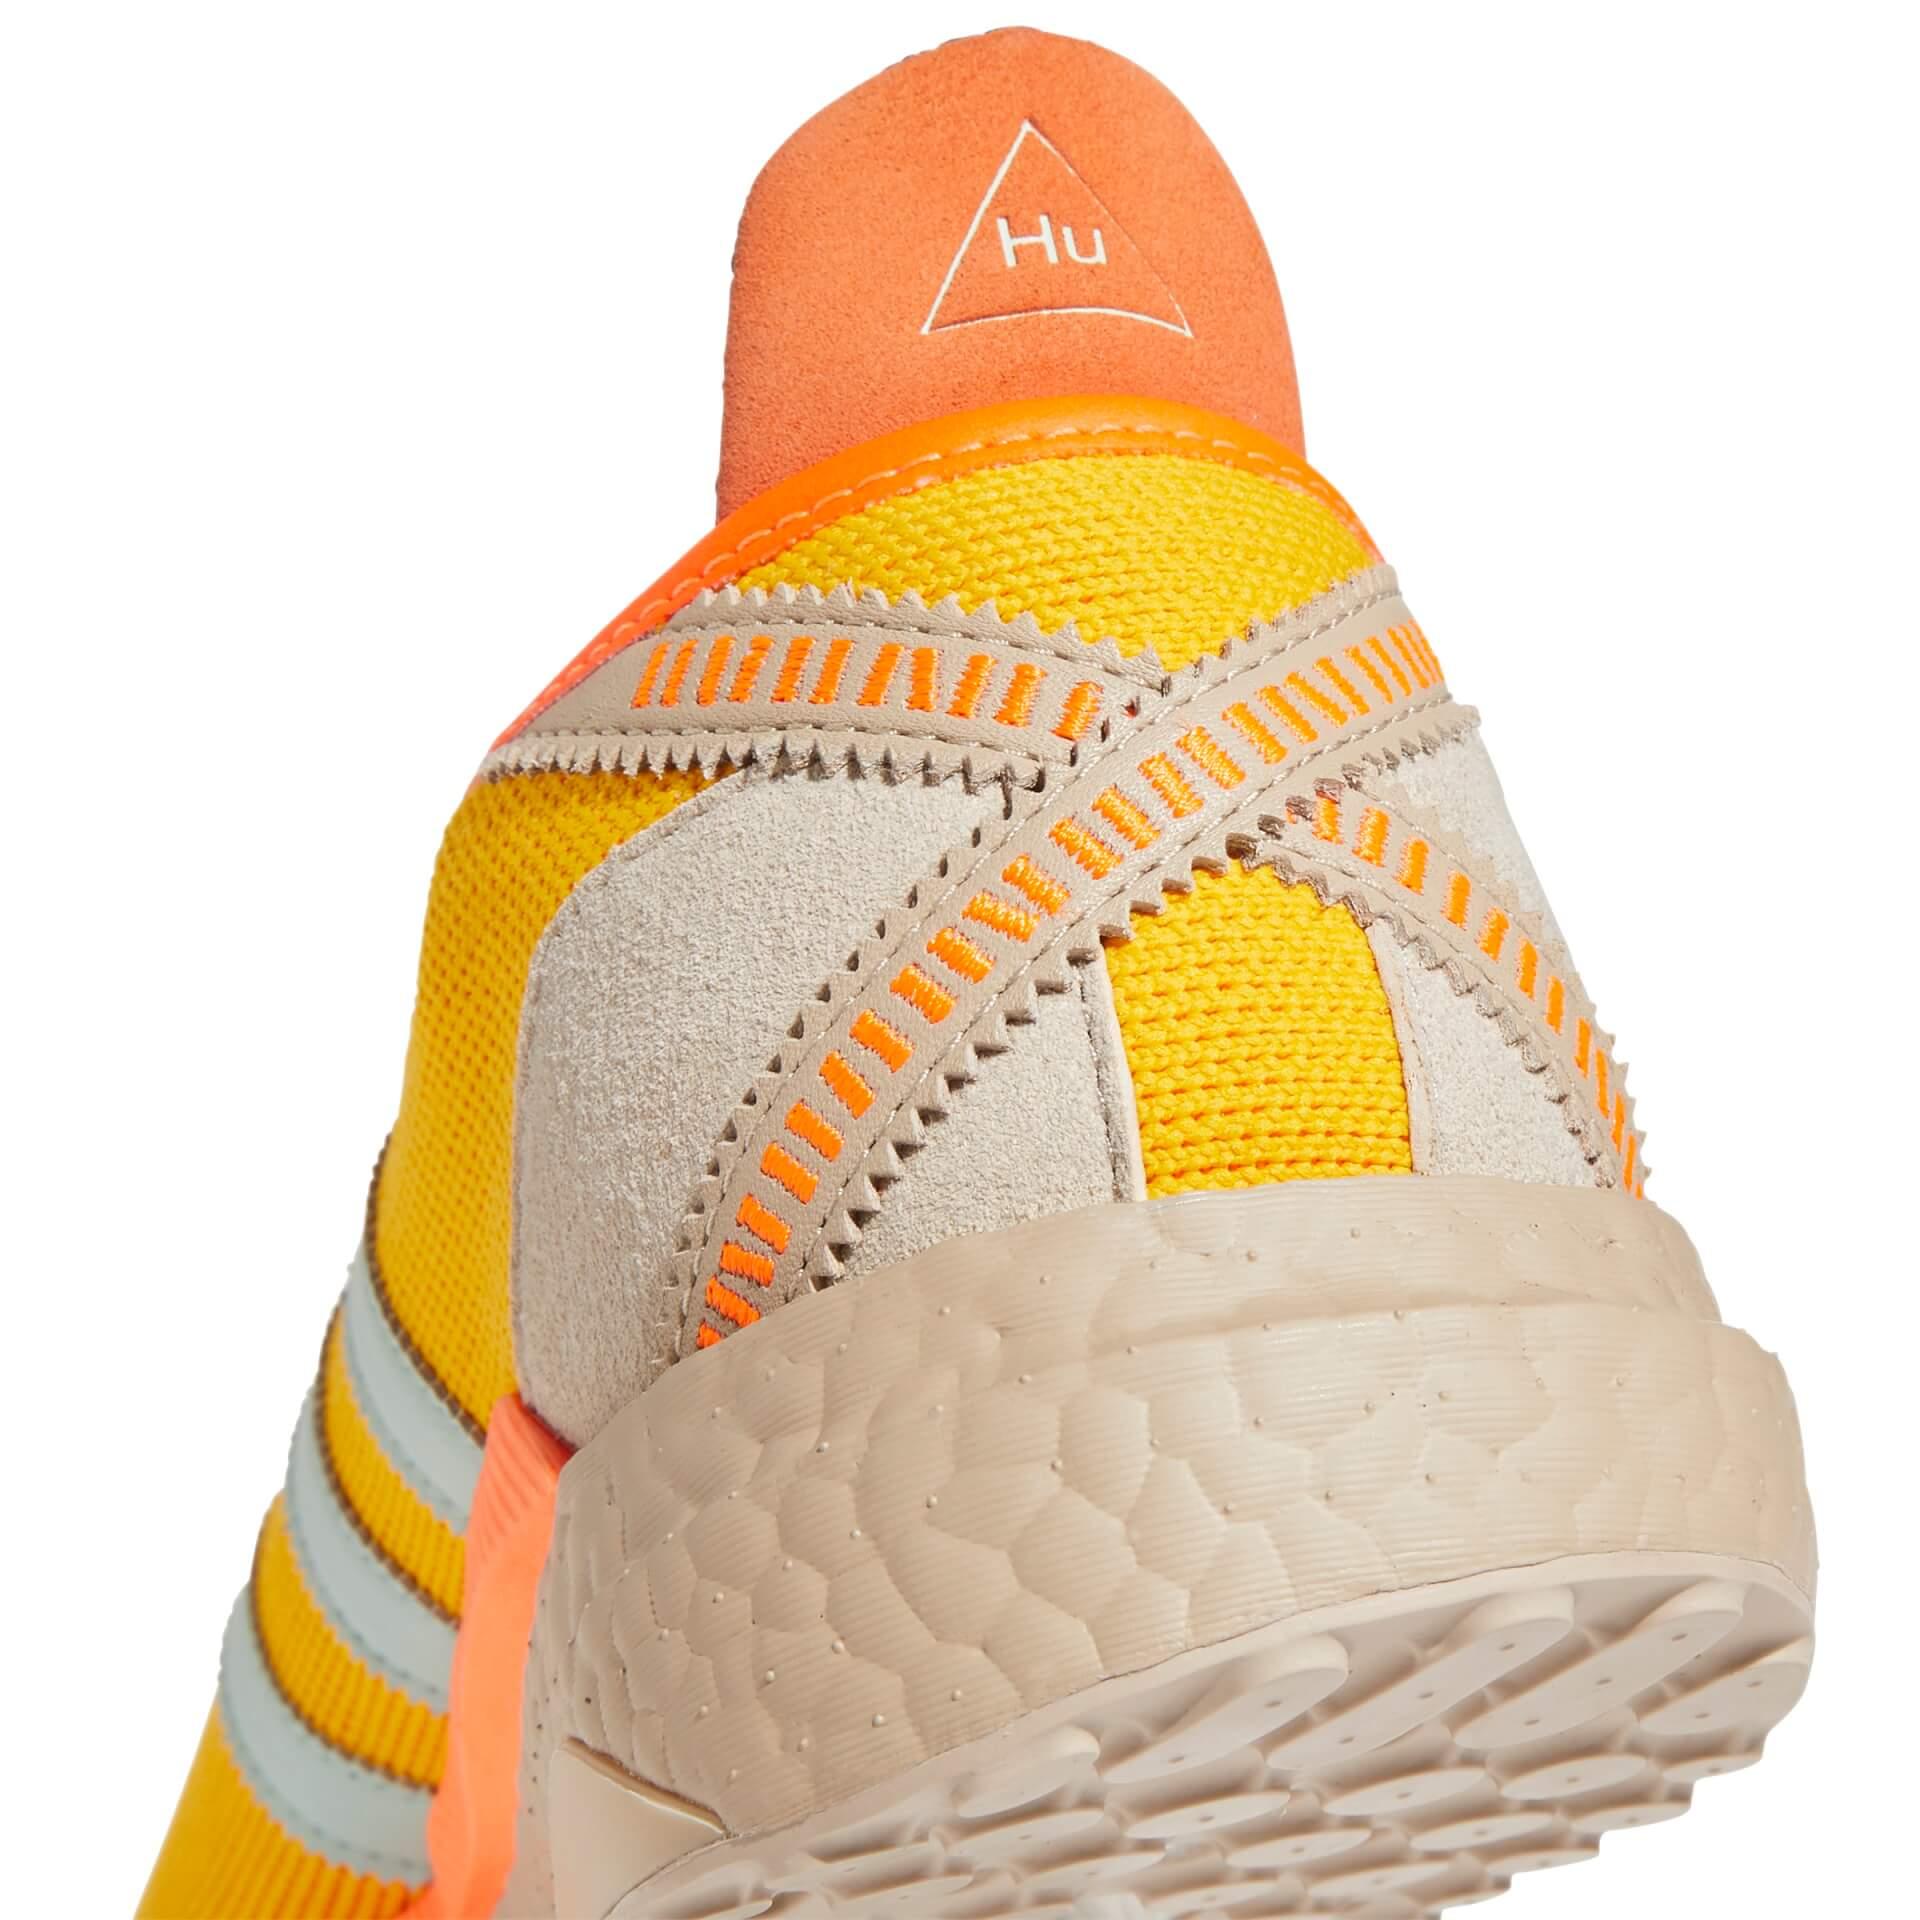 adidas Originalsから『Pharrell Williams x NIGO(R)FRIENDSHIP PACK』が発売!2種類のフットウェアが登場 fashion201217_adidas_pharrell_nigo_8